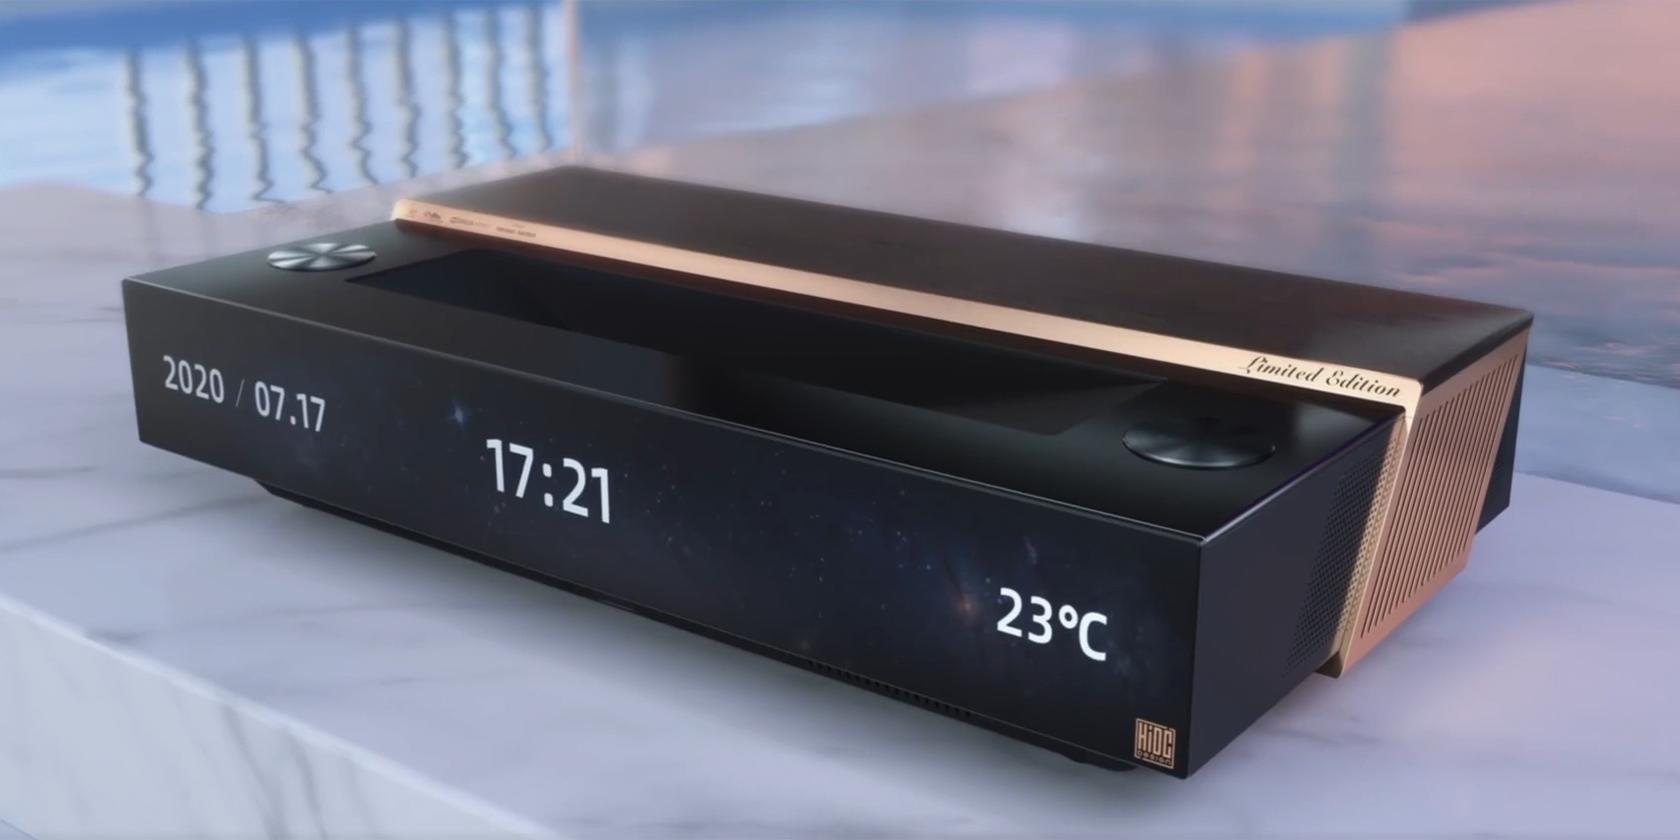 Hisense Reveals Groundbreaking Laser TV at CES 2021